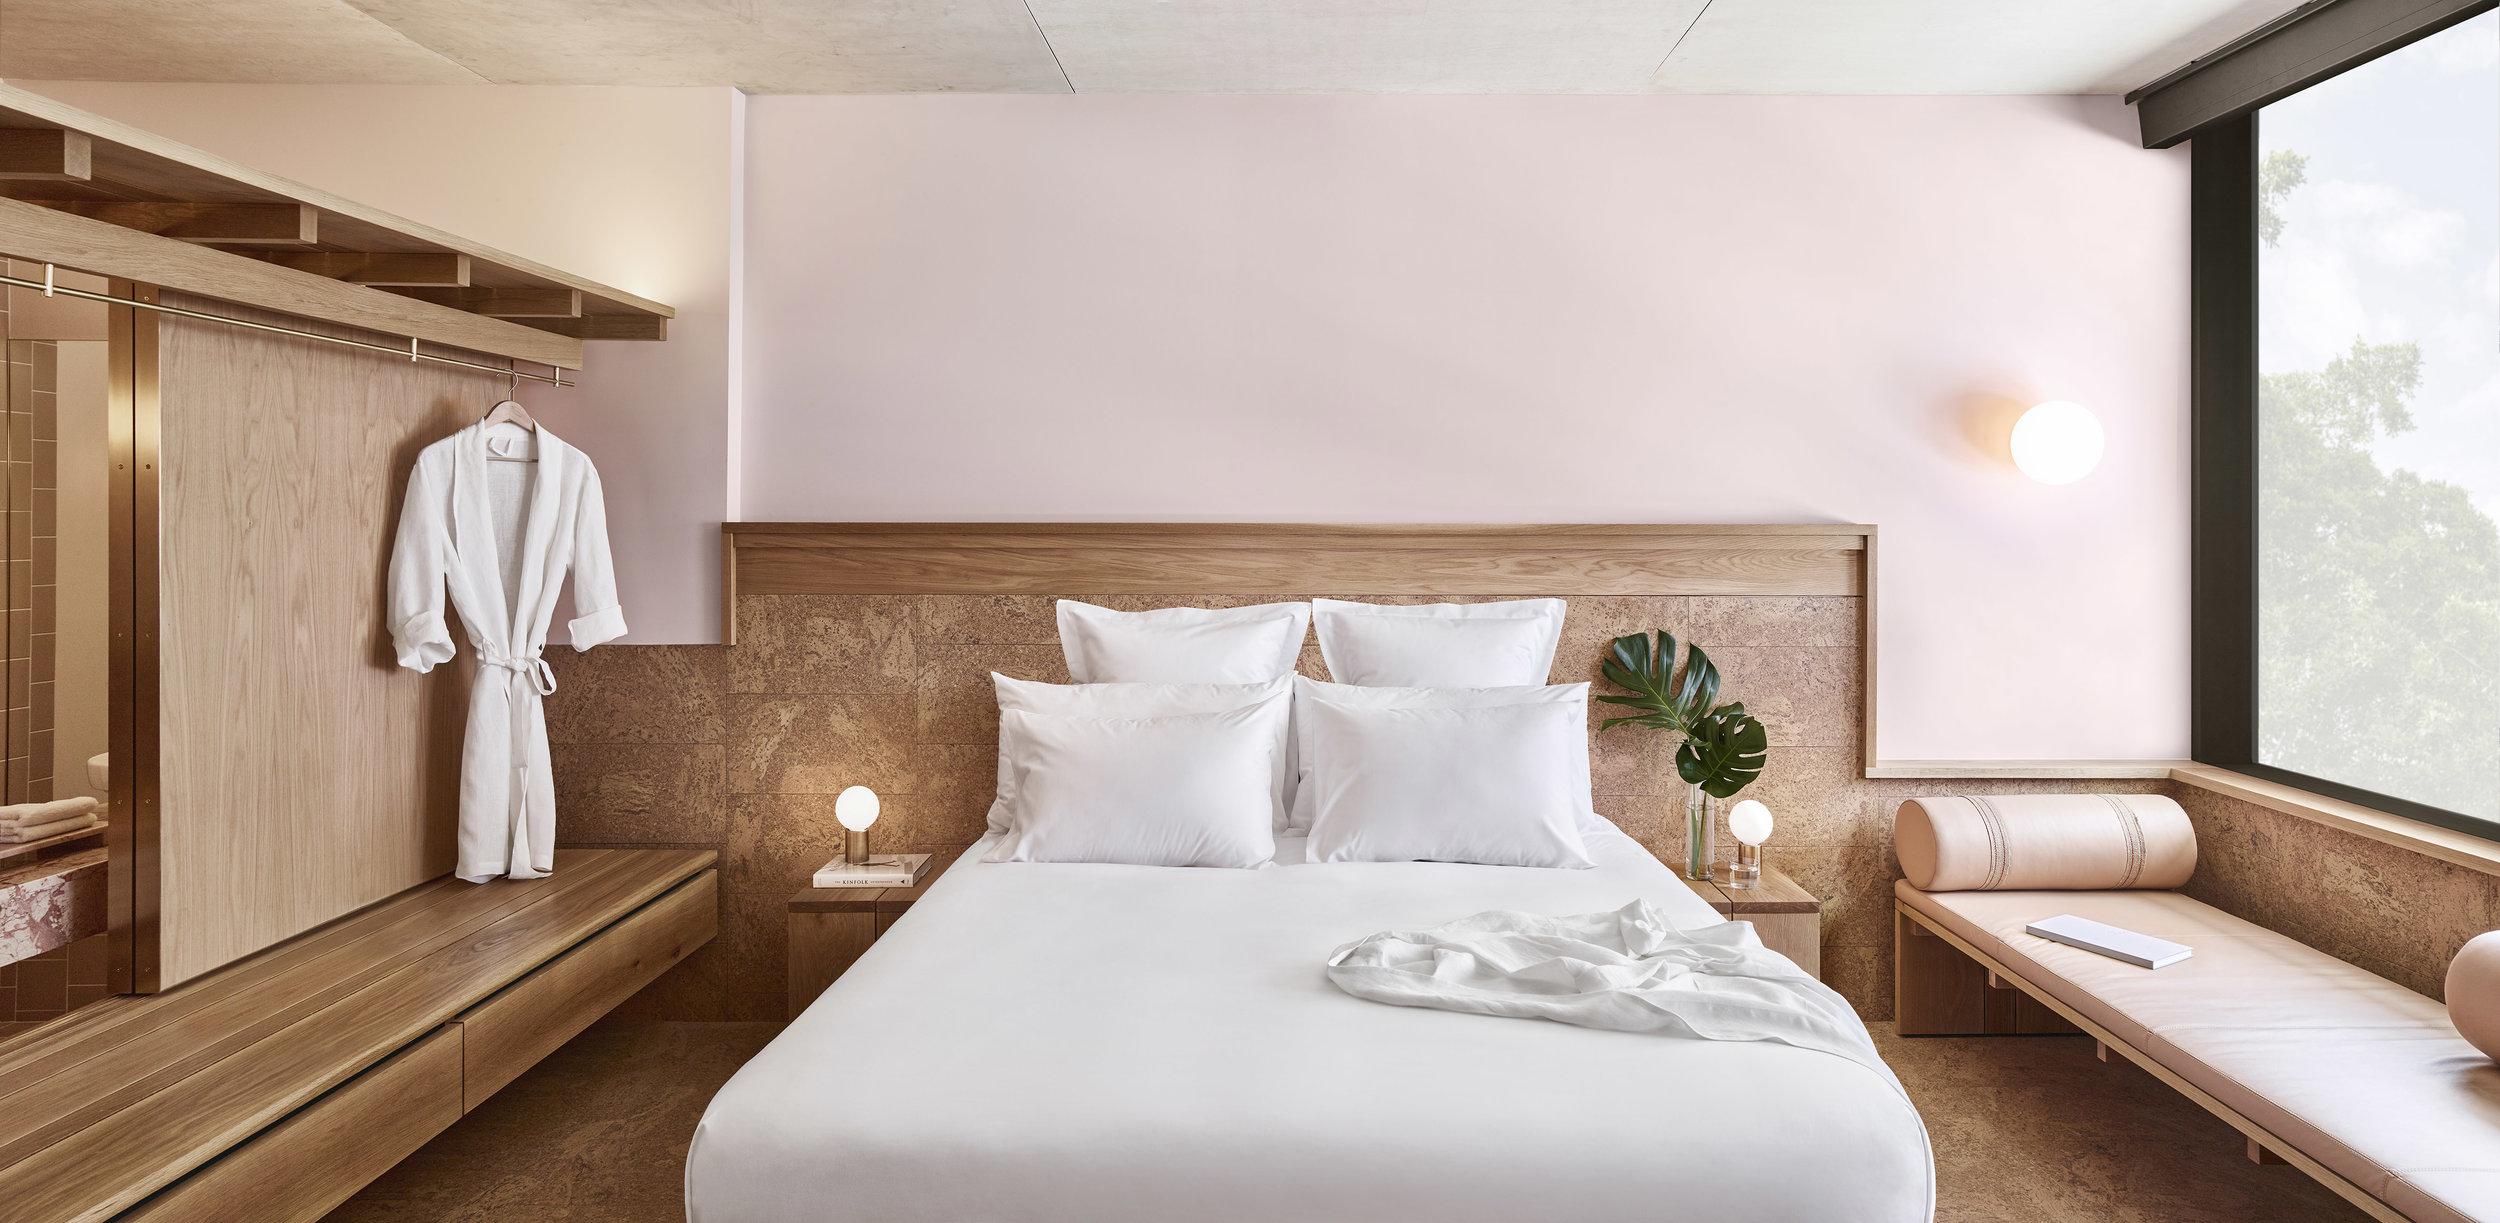 The Calile Hotel Prototype Room55021 Lights Bathroom Open Styled Edit.jpg